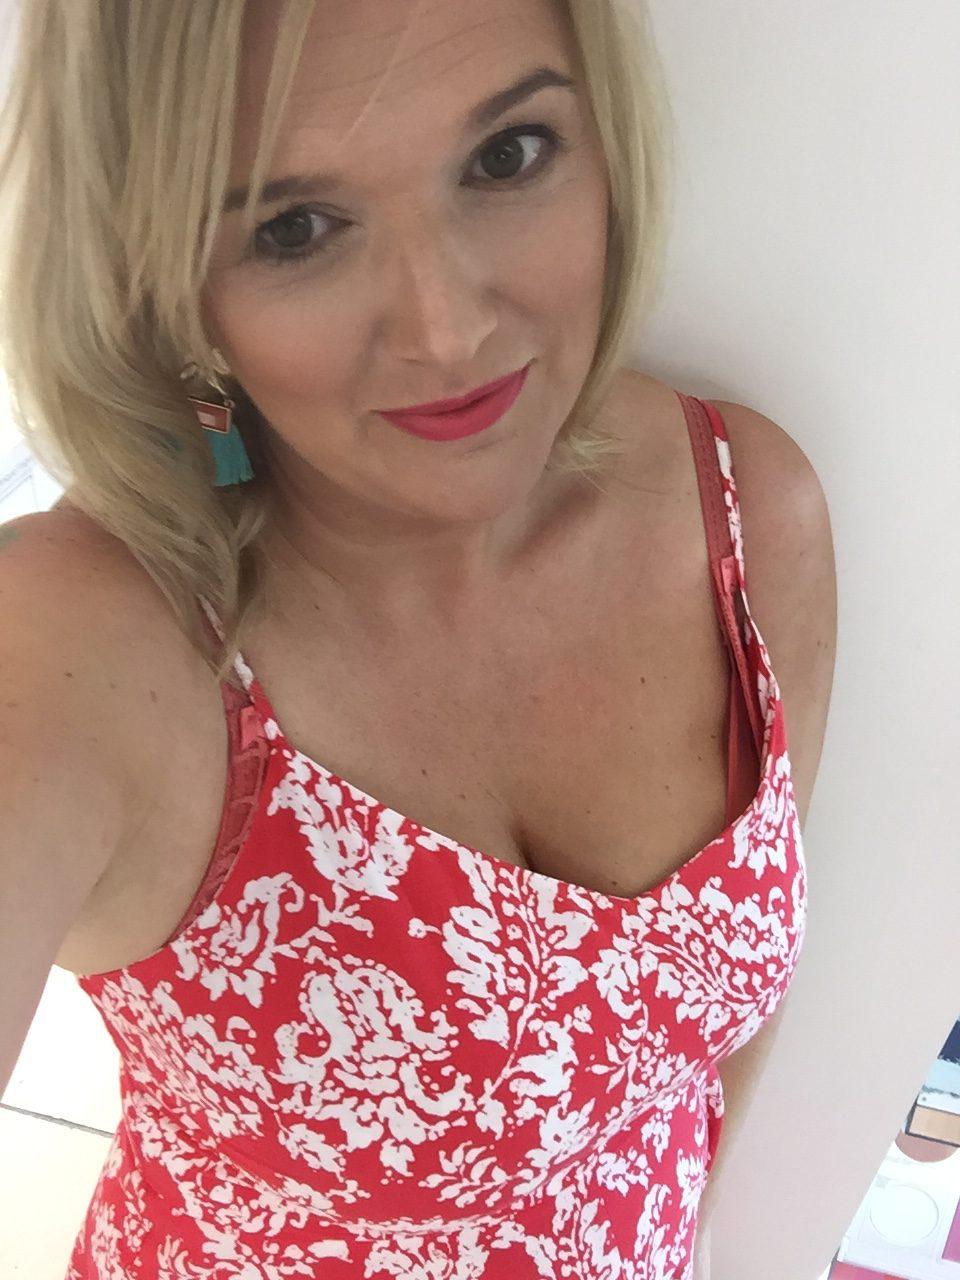 Jojo Fraser - Edinburgh blogger and author